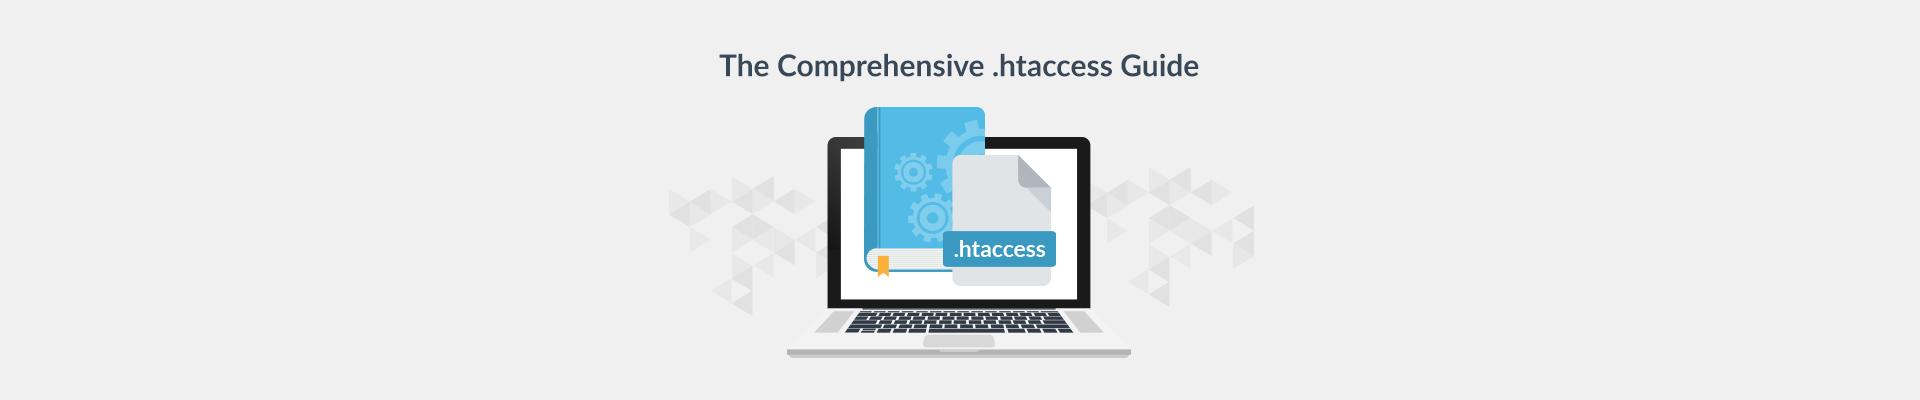 Comprehensive .htaccess Guide / .htaccess tutorial - Plesk .htaccess basics - Guides